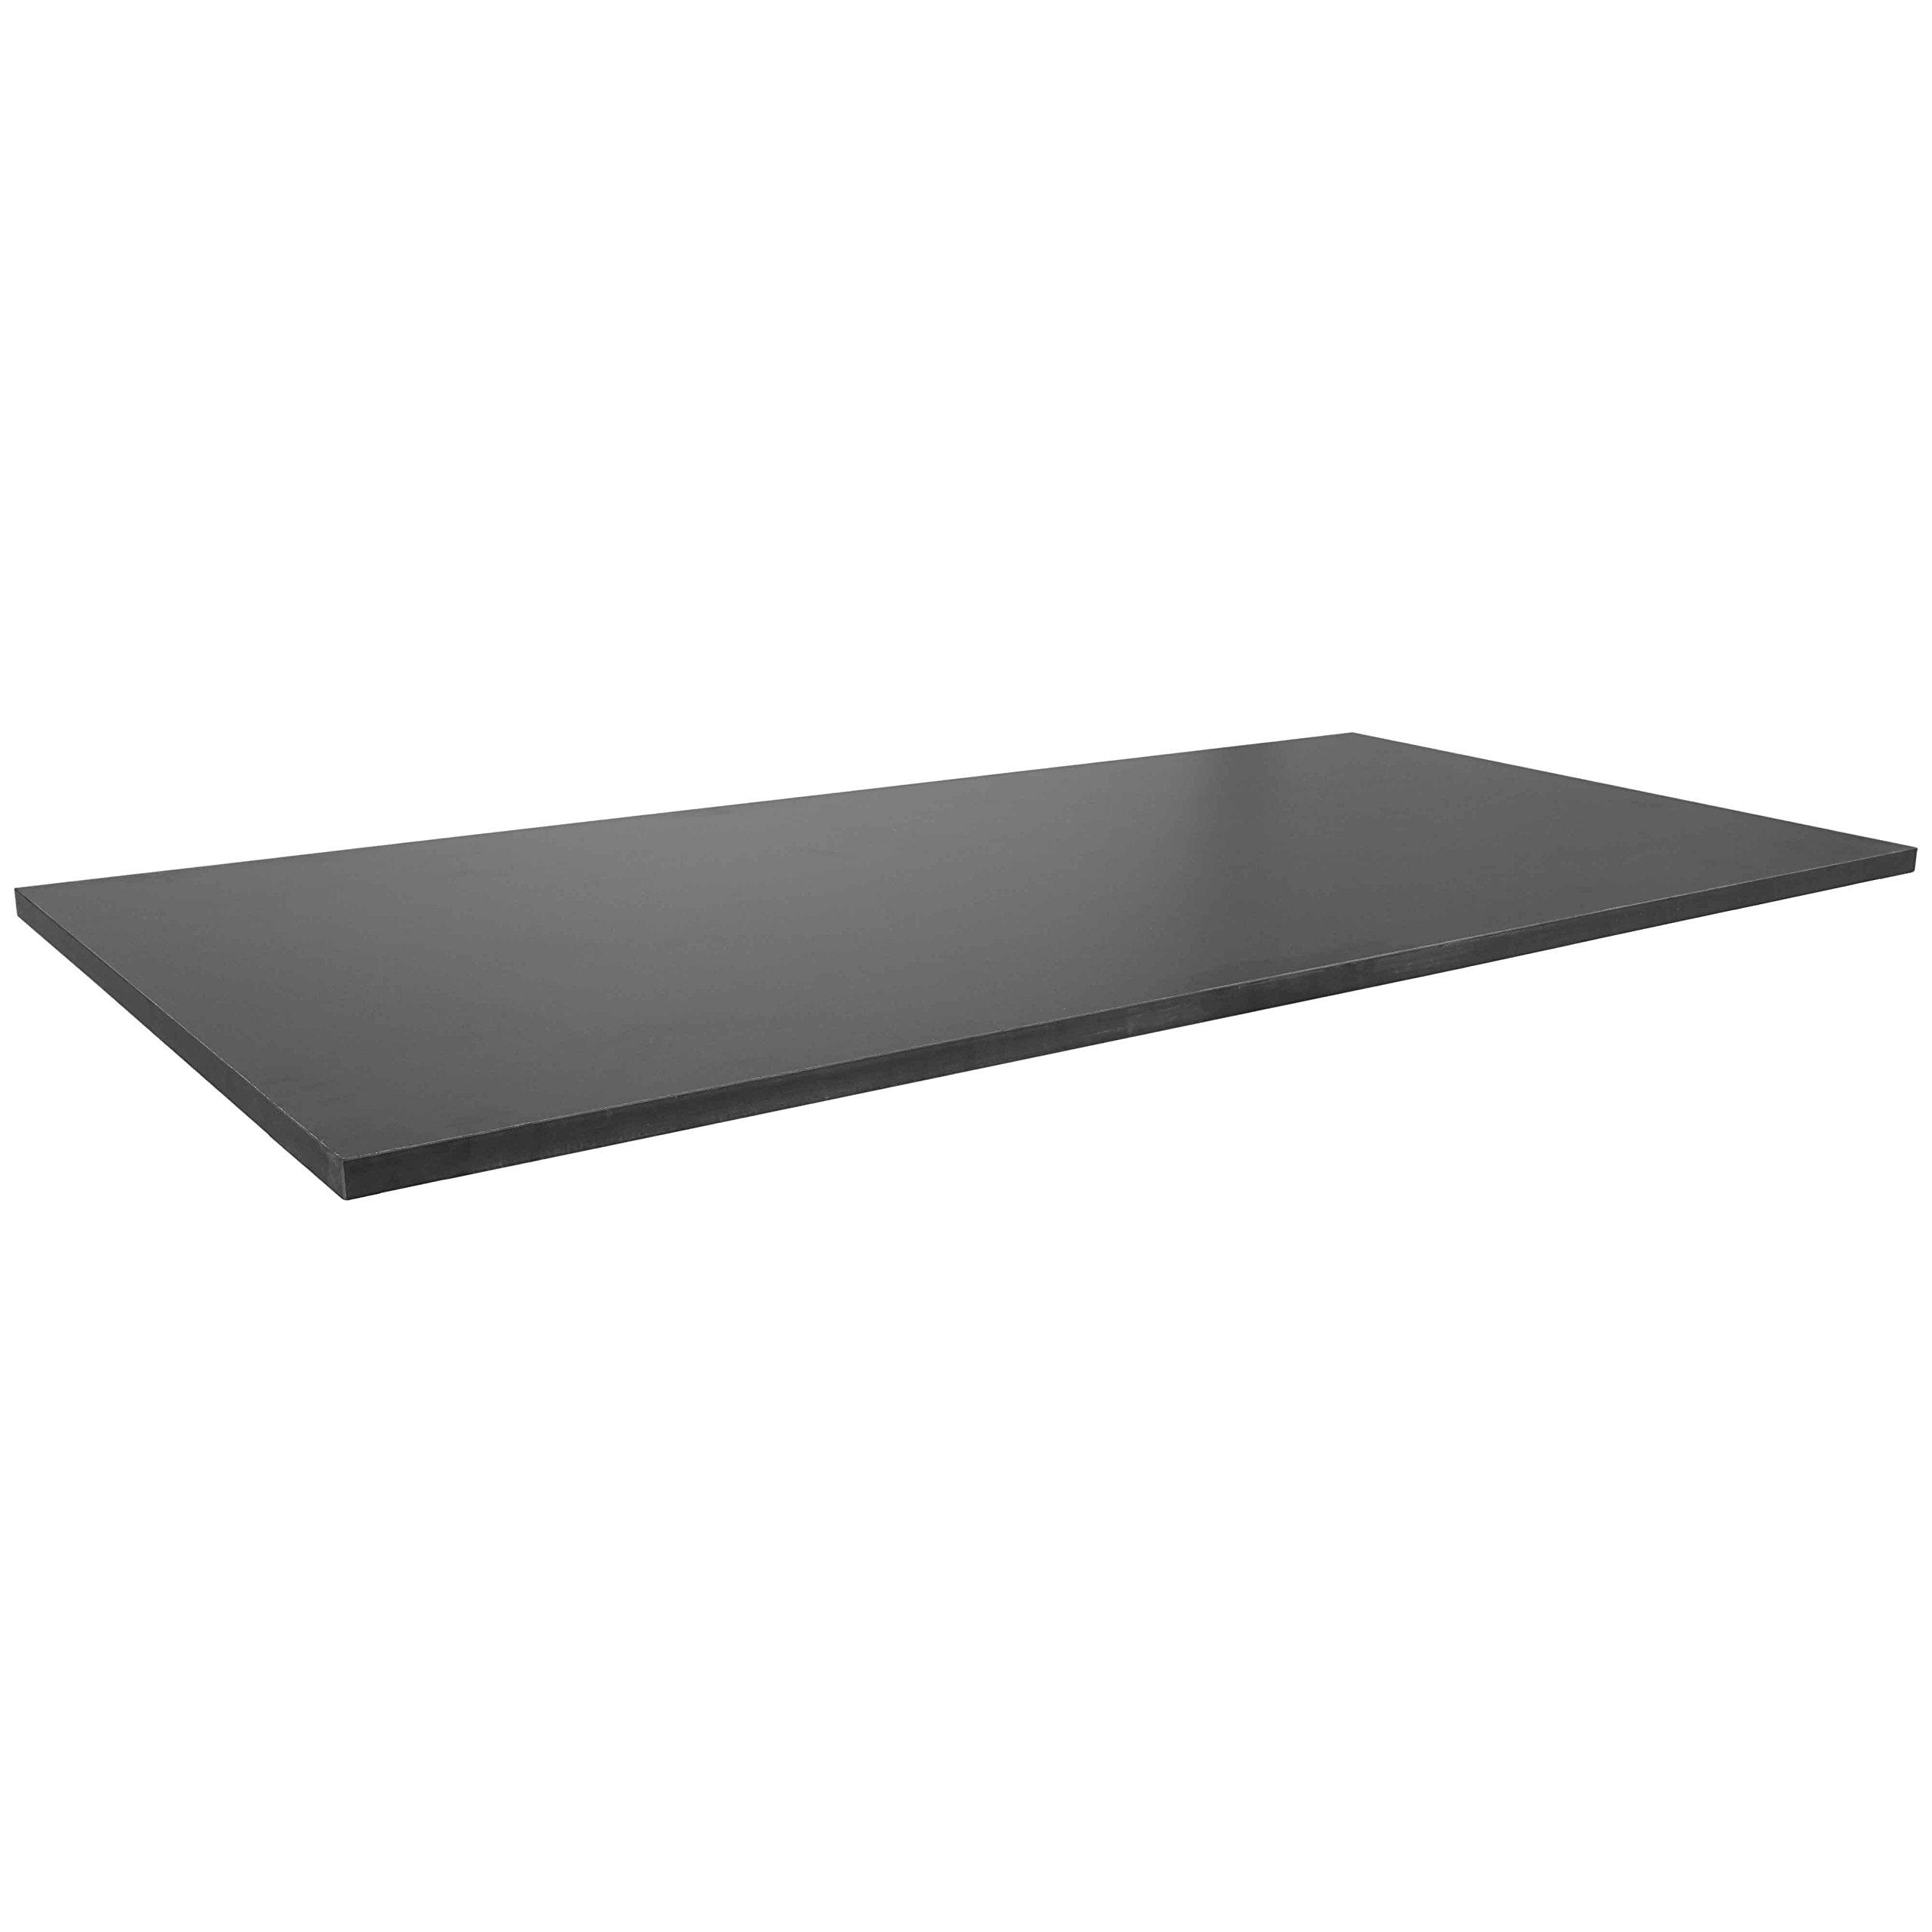 Titan Universal Desk Top - 30'' x 60'' Black